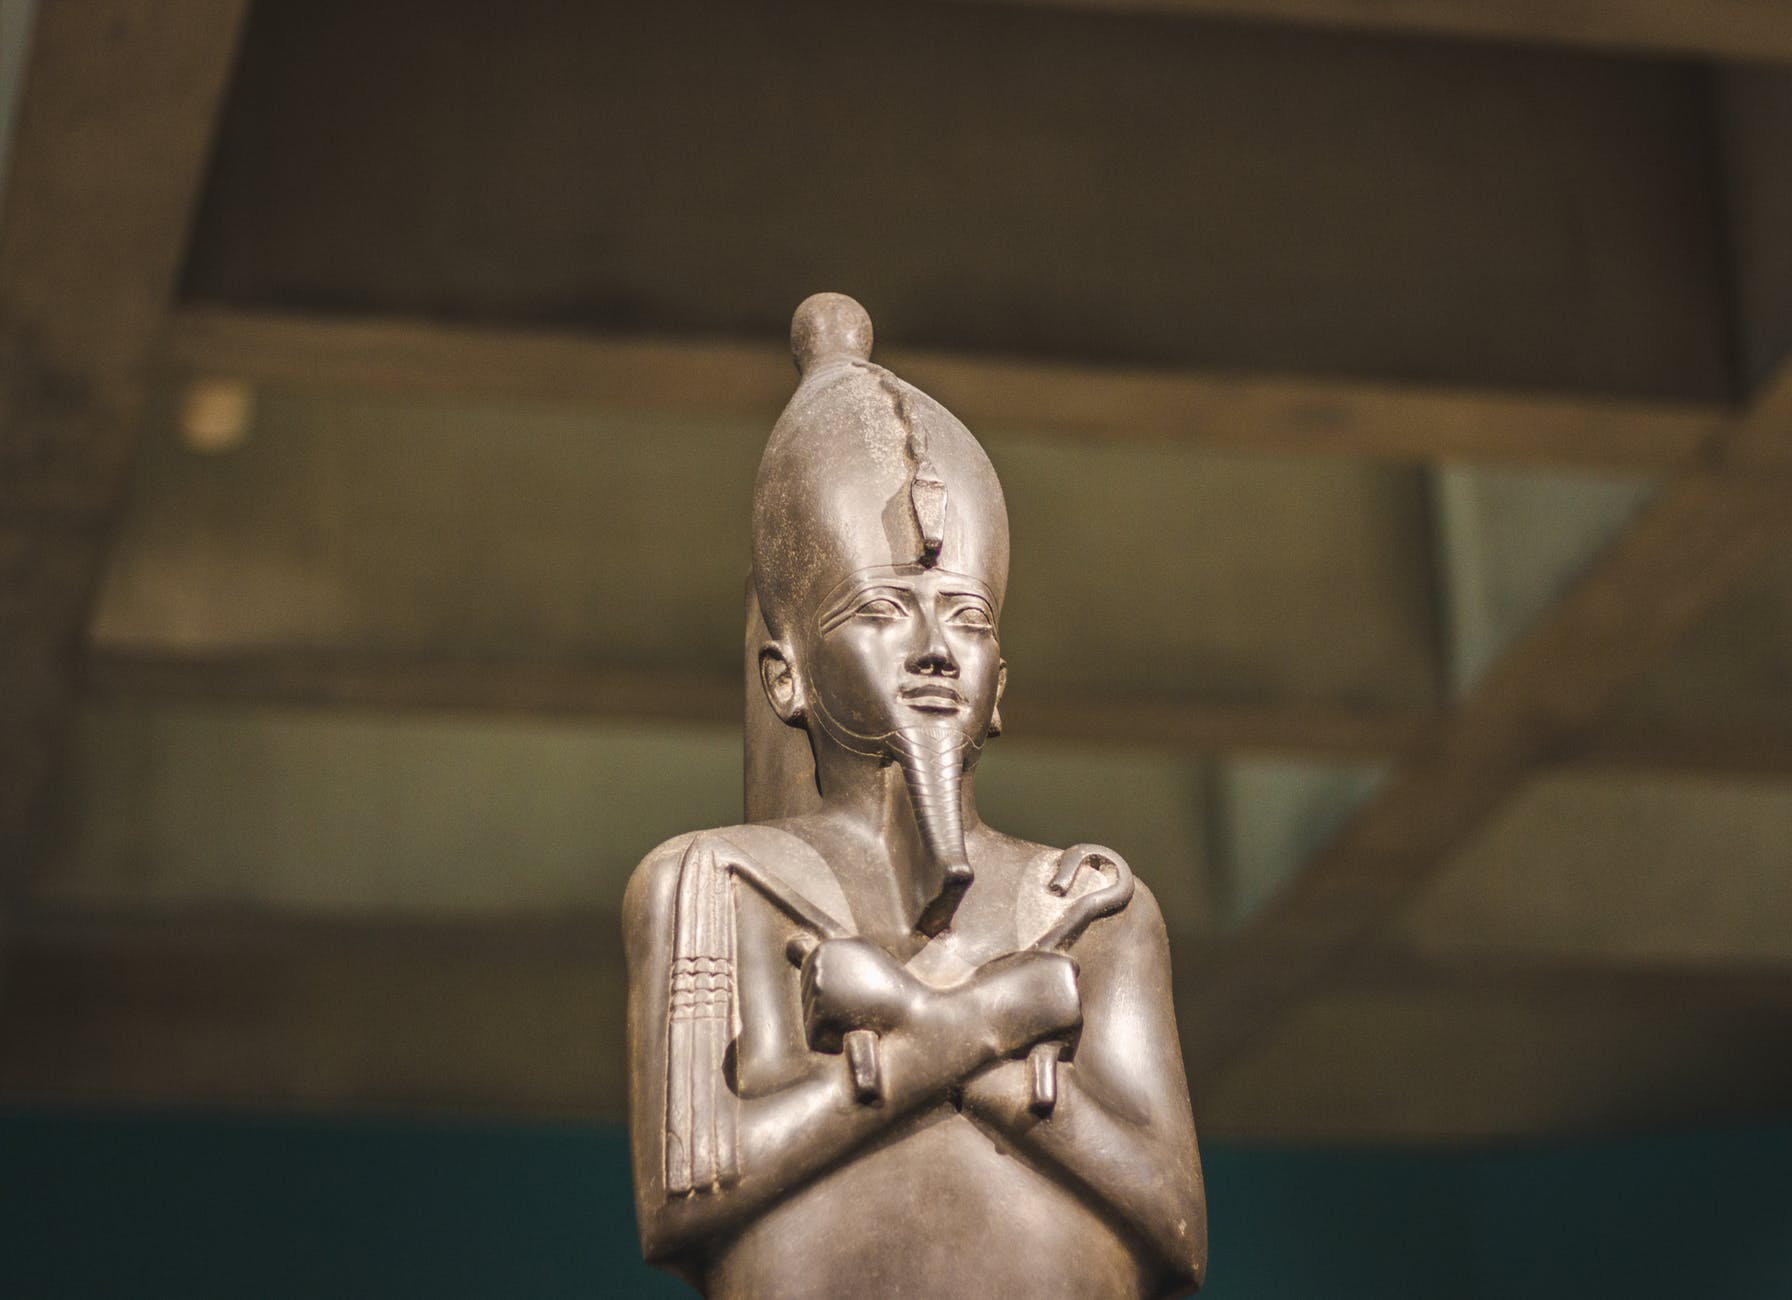 close up photo of pharaoh figurine